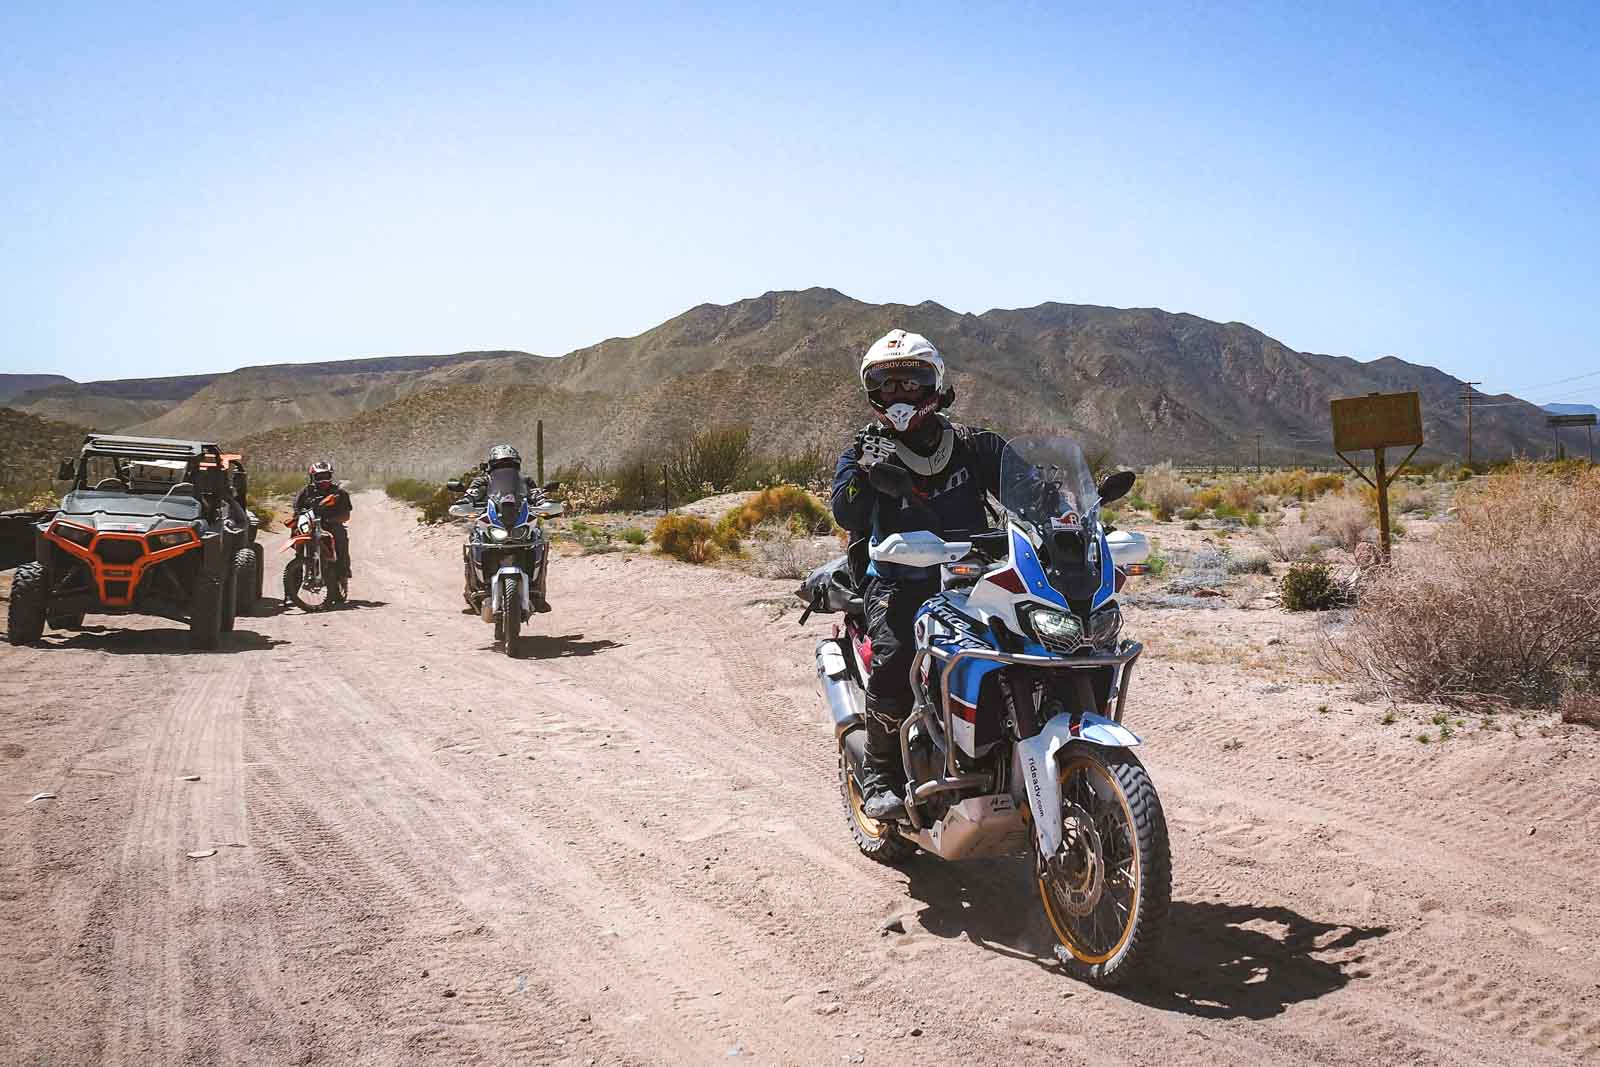 offroad-baja-adventure-motorcycle-tour